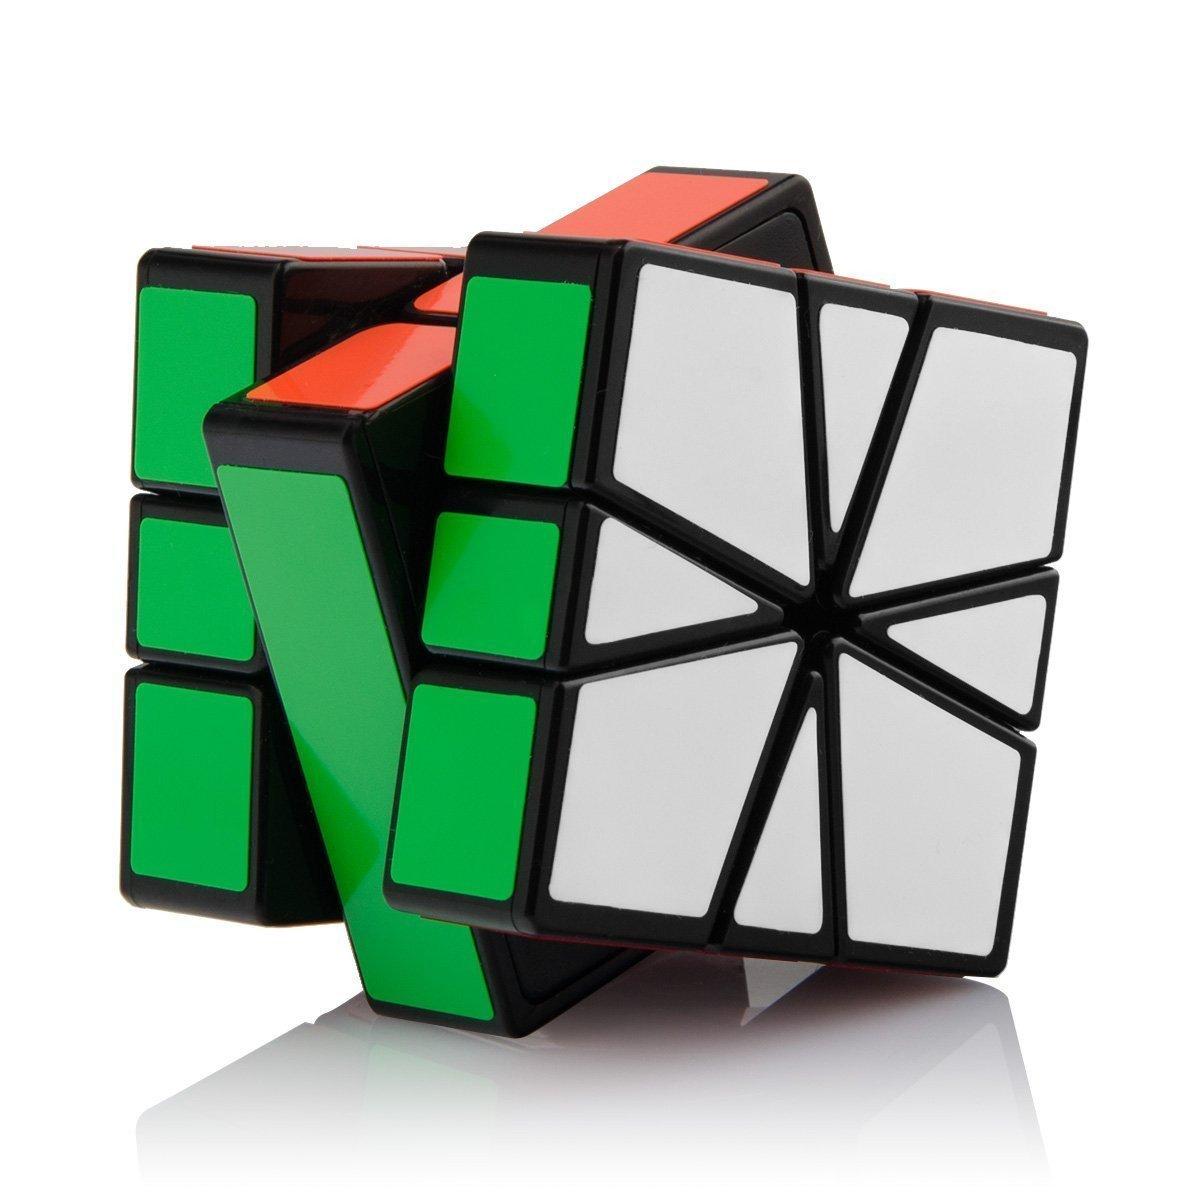 Guanlong SQ-1 Non-cubic Speed Cube Square-1 Shapes Puzzles Cube Black